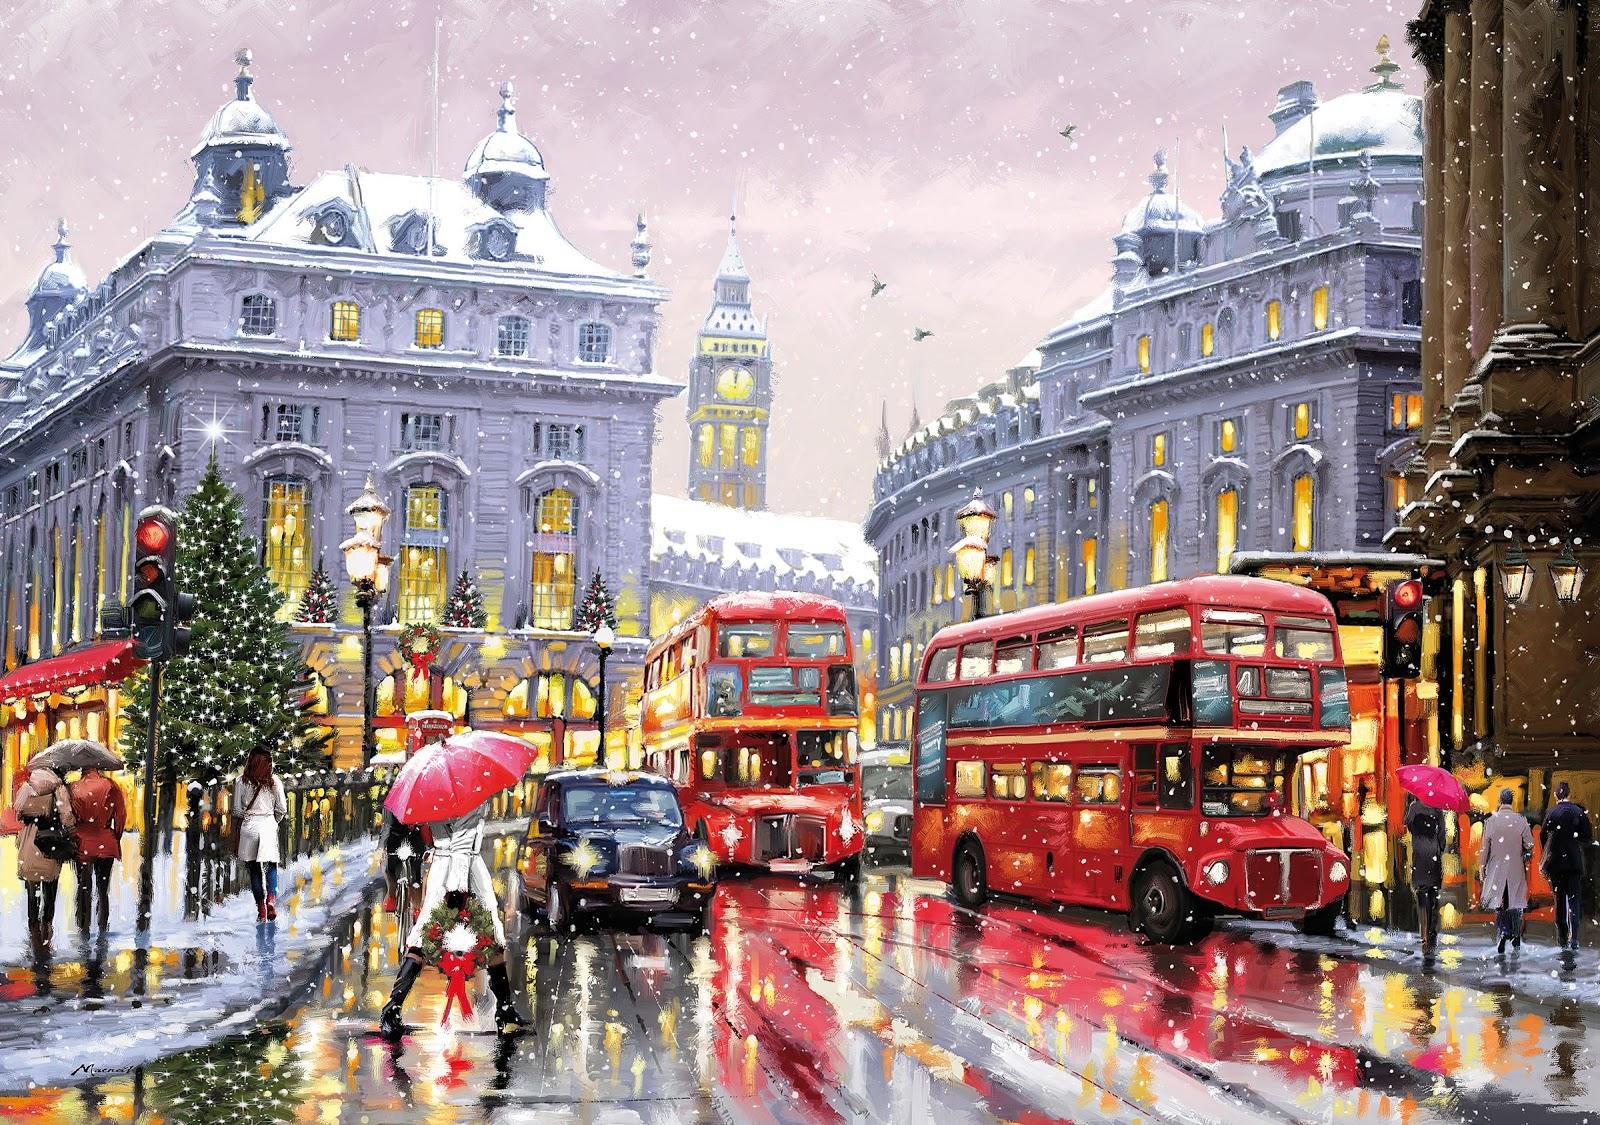 Richard Macneil London in Snow